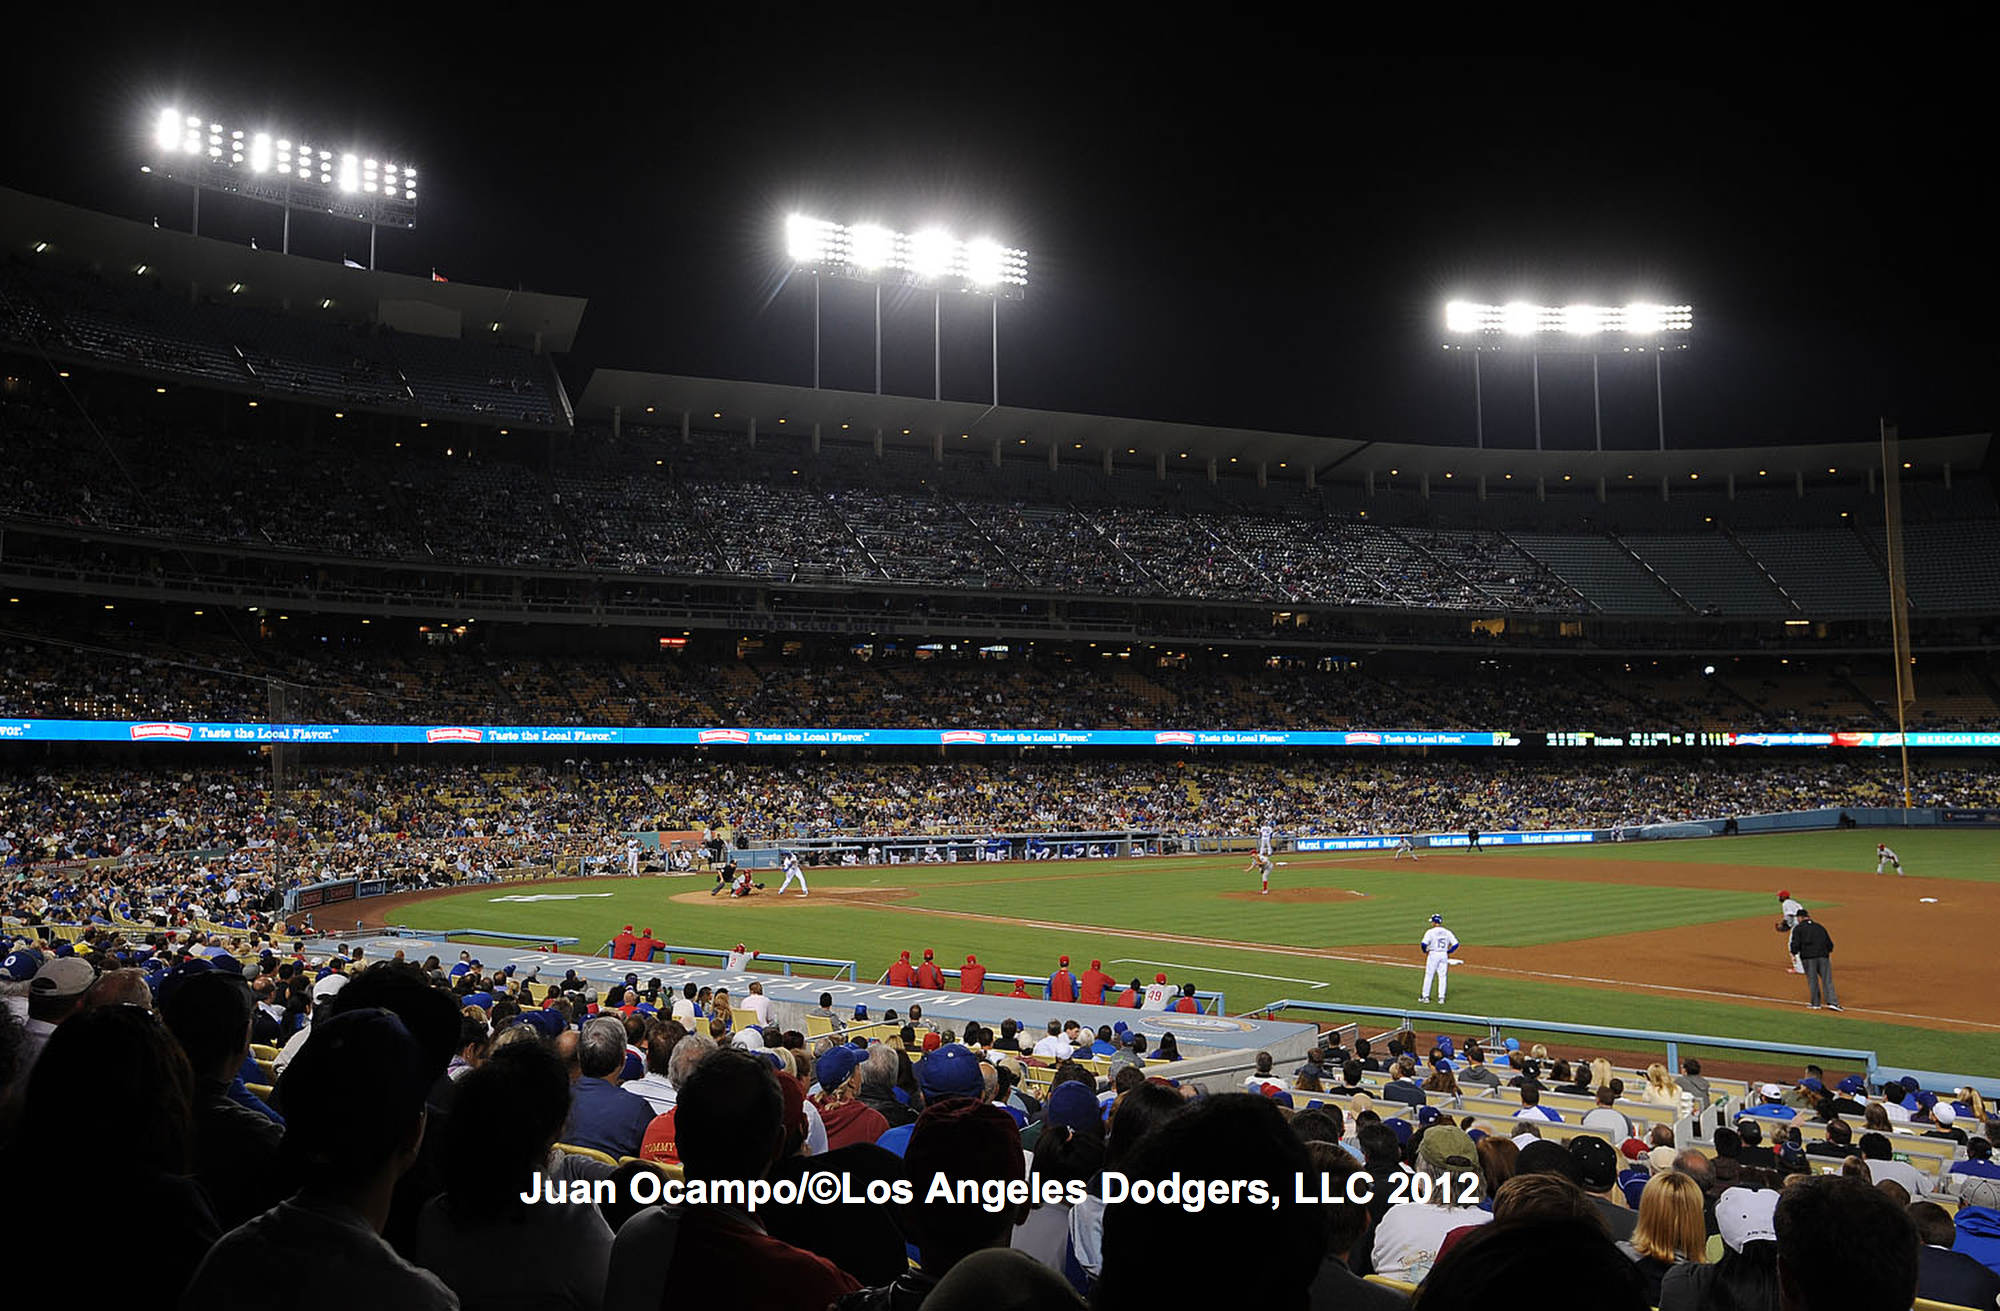 Los Angeles Dodgers Baseball Stadium Los Angeles Dodgers v